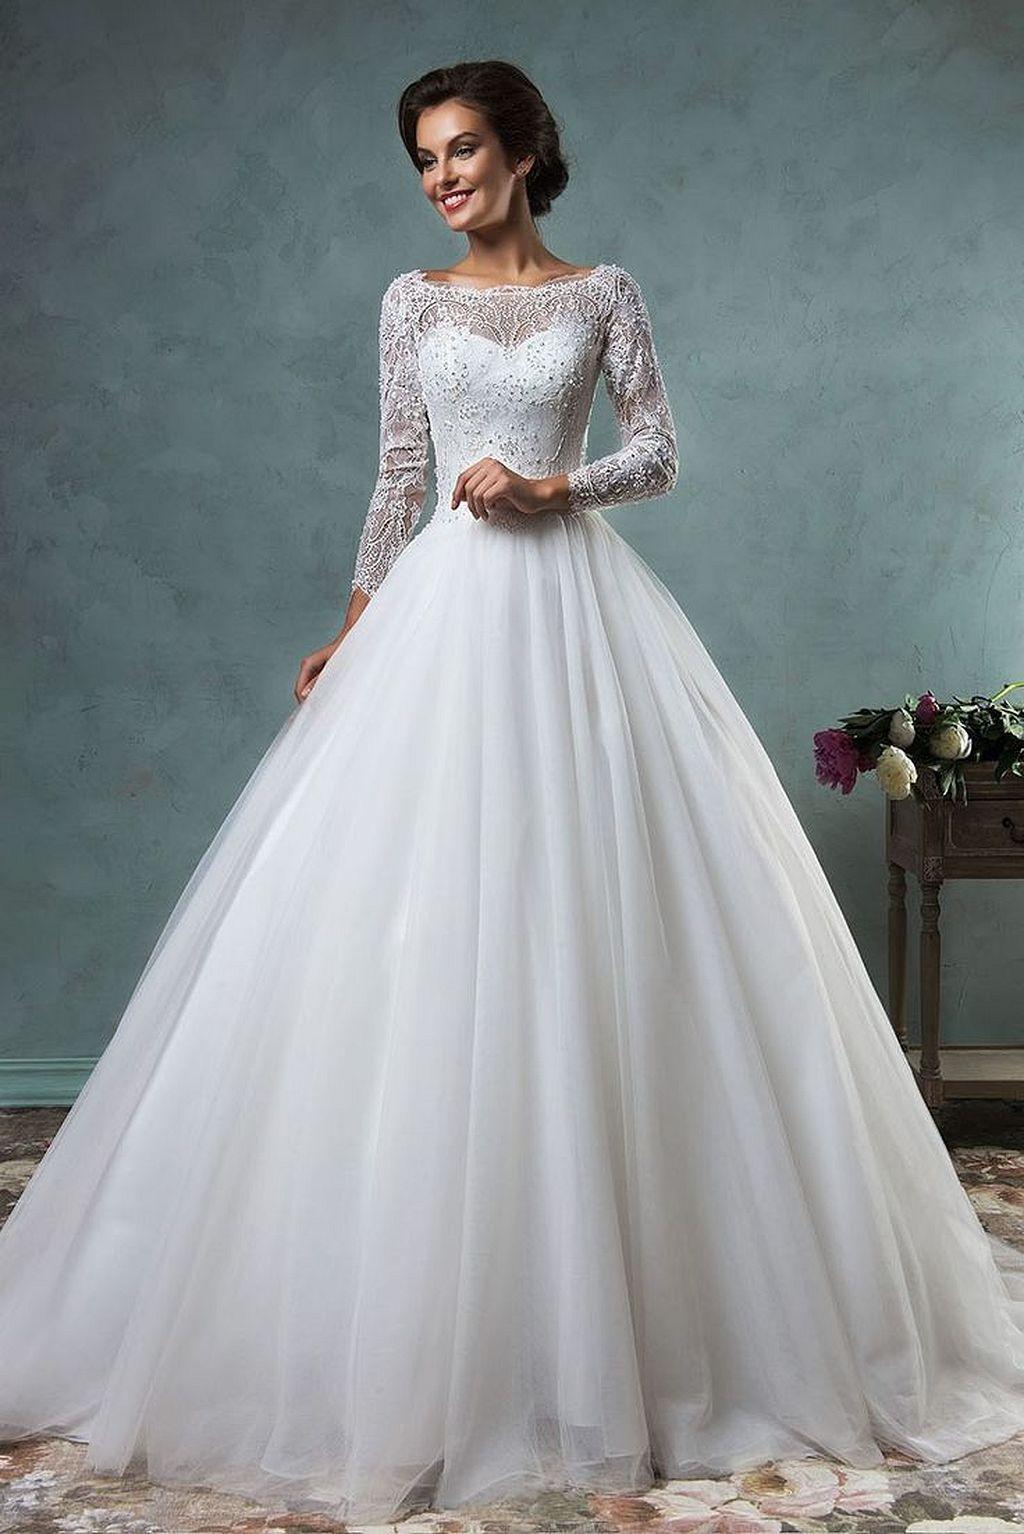 30+ Beautiful Christmas Wedding Dresses | MY WEDDING | Pinterest ...